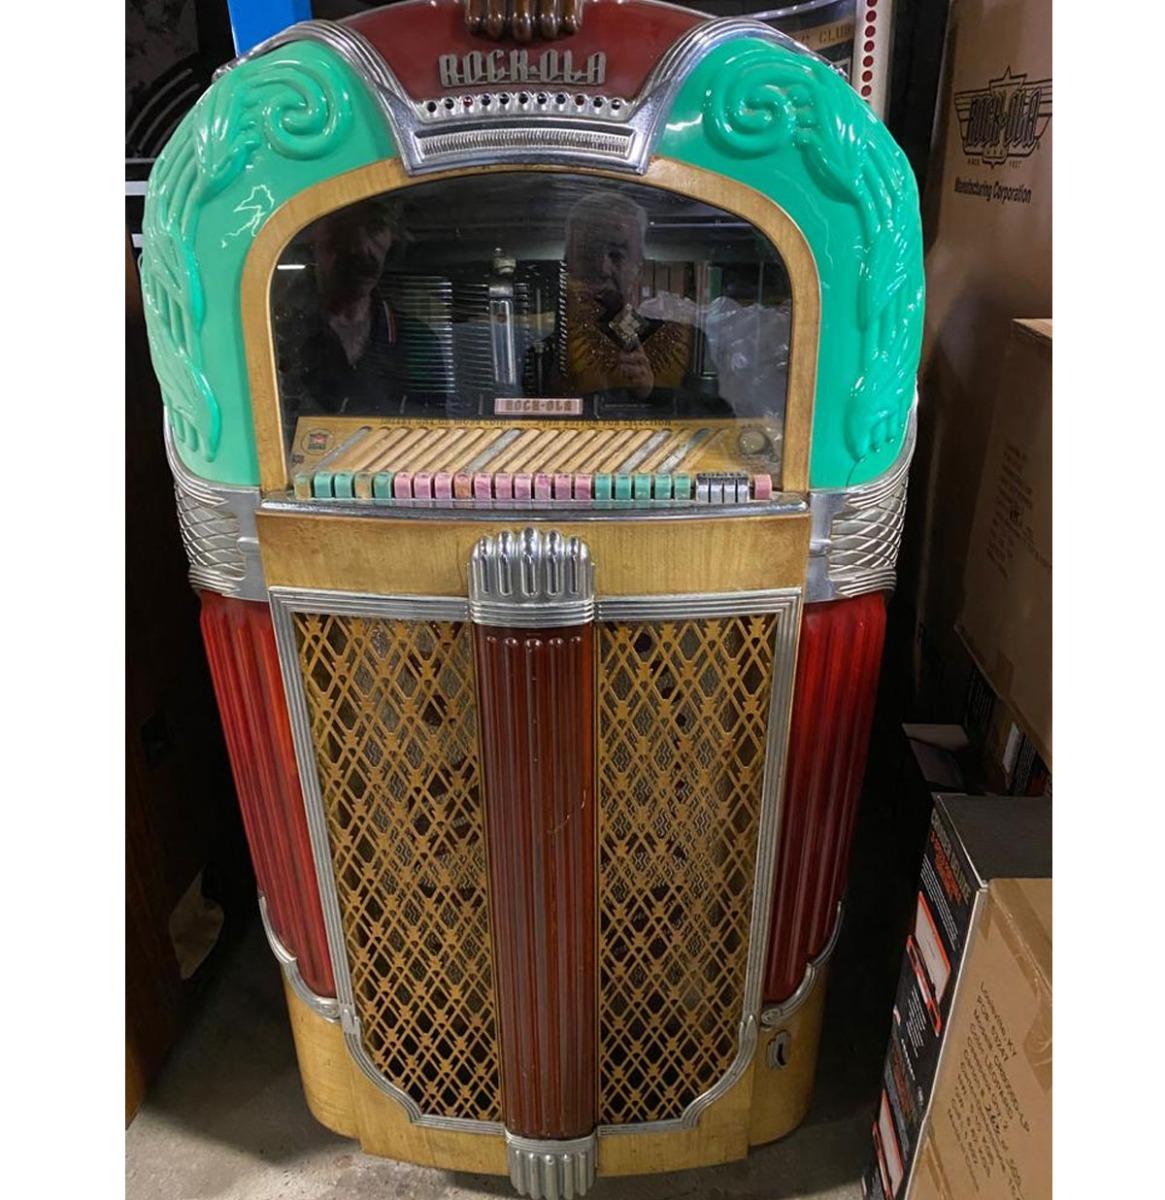 Rock-Ola 1428 Jukebox - 1946 - Origineel - 20 Select